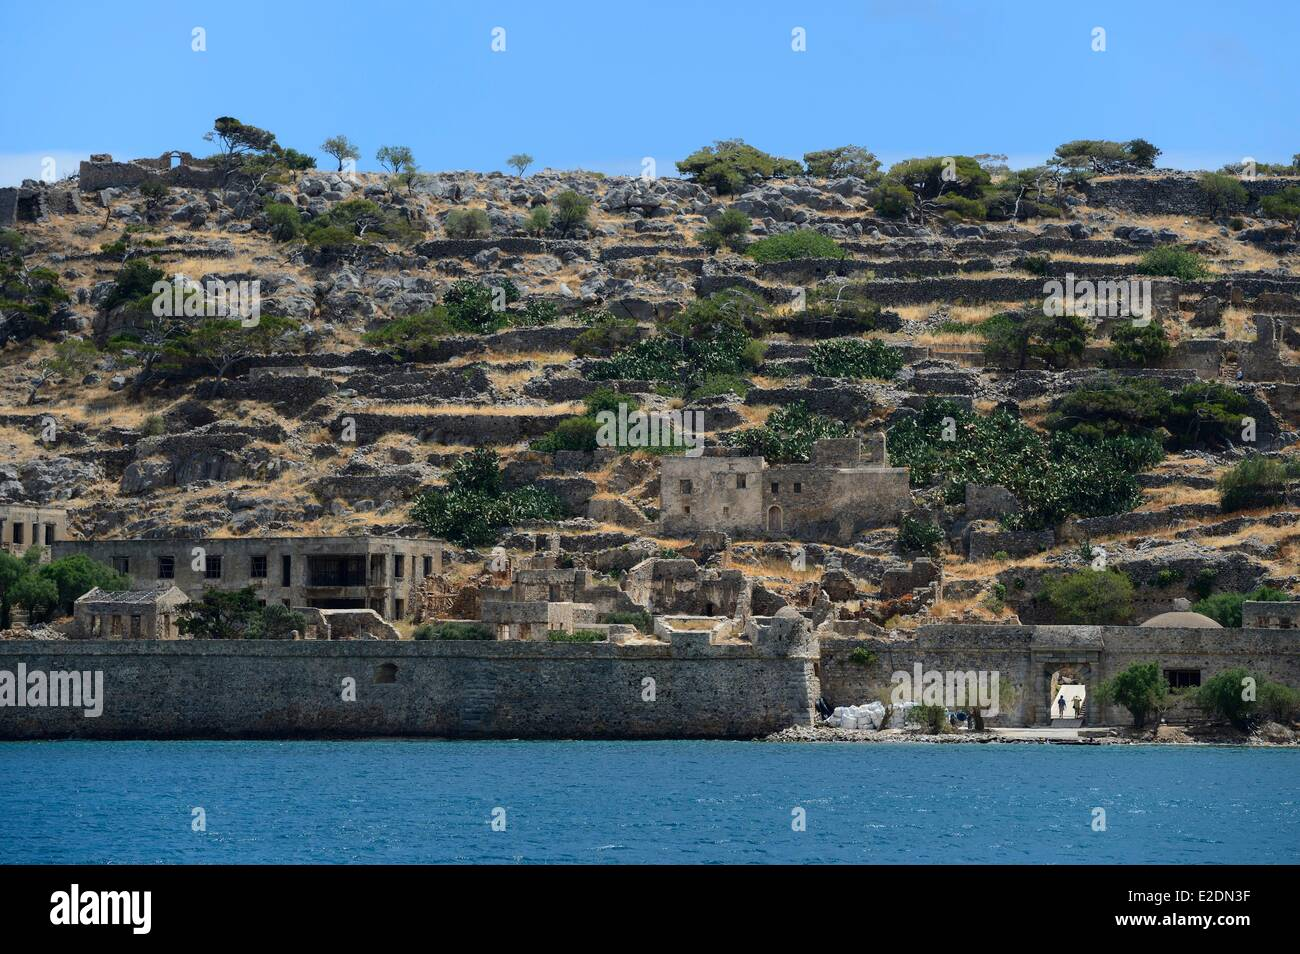 Greece Crete Agios Nikolaos region Elounda island Spinalonga Fort (Kalydon) Venetian fortress - Stock Image